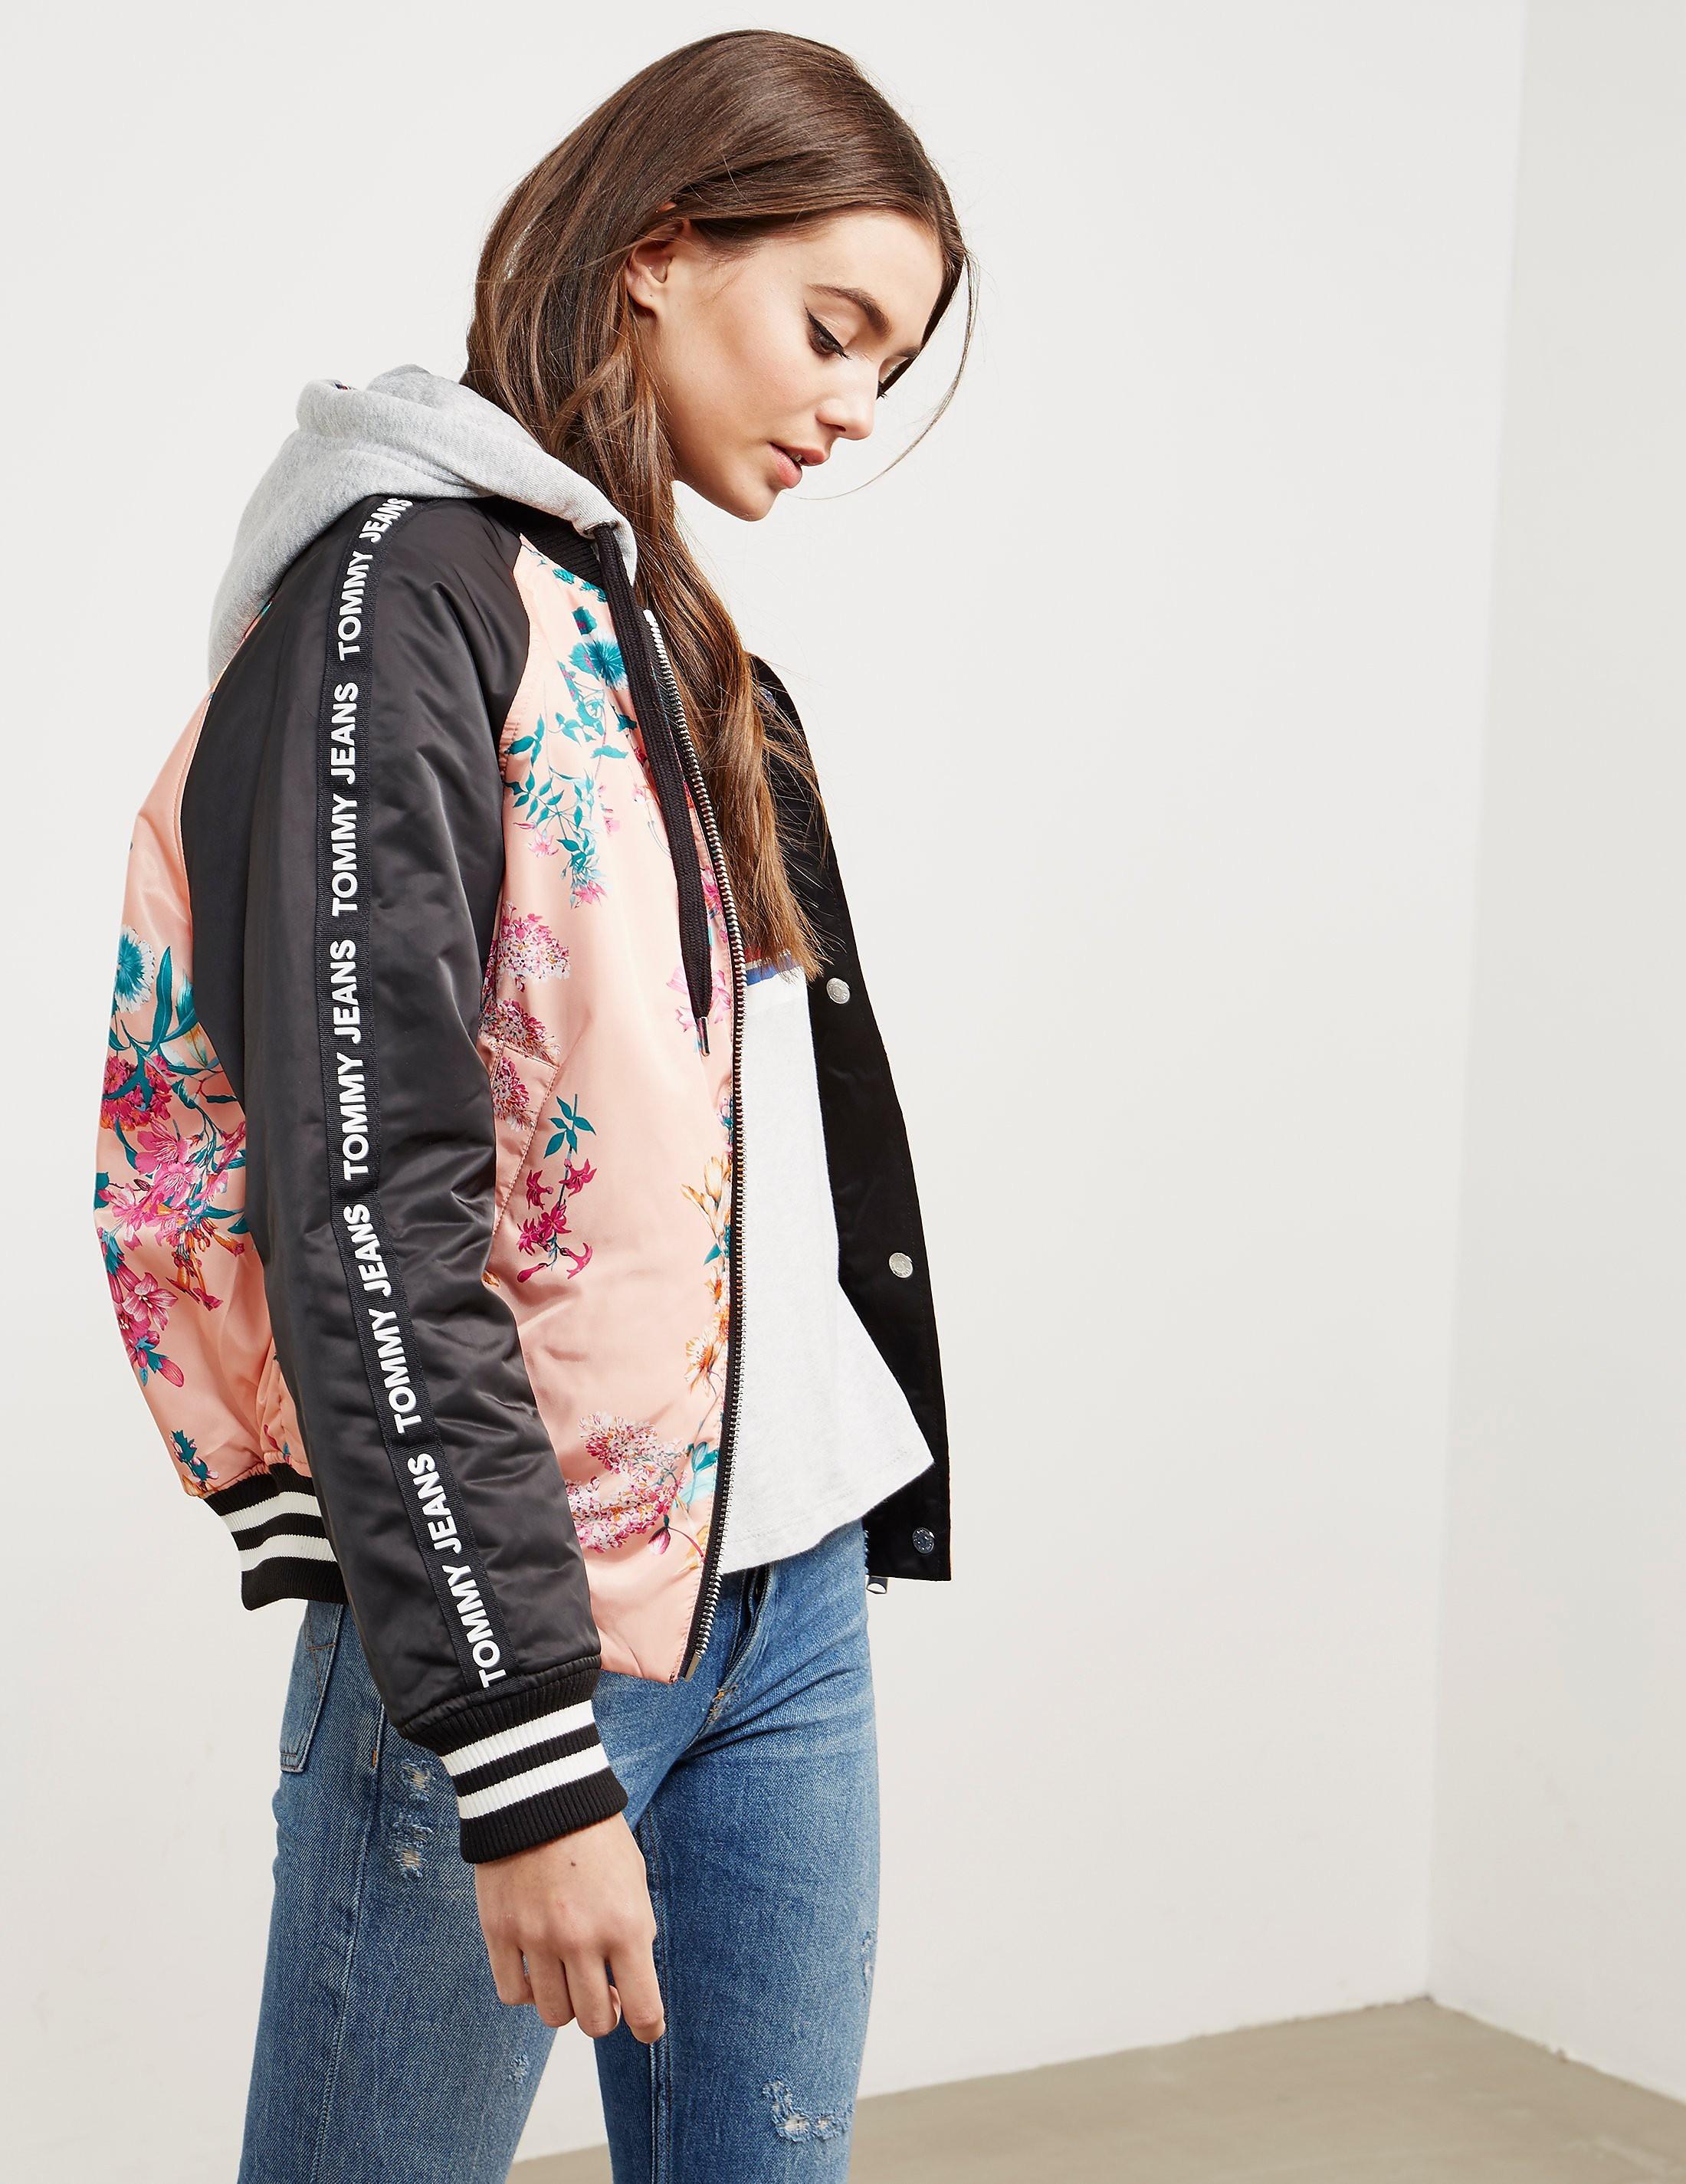 Tommy Hilfiger Reverse Floral Hooded Jacket - Online Exclusive